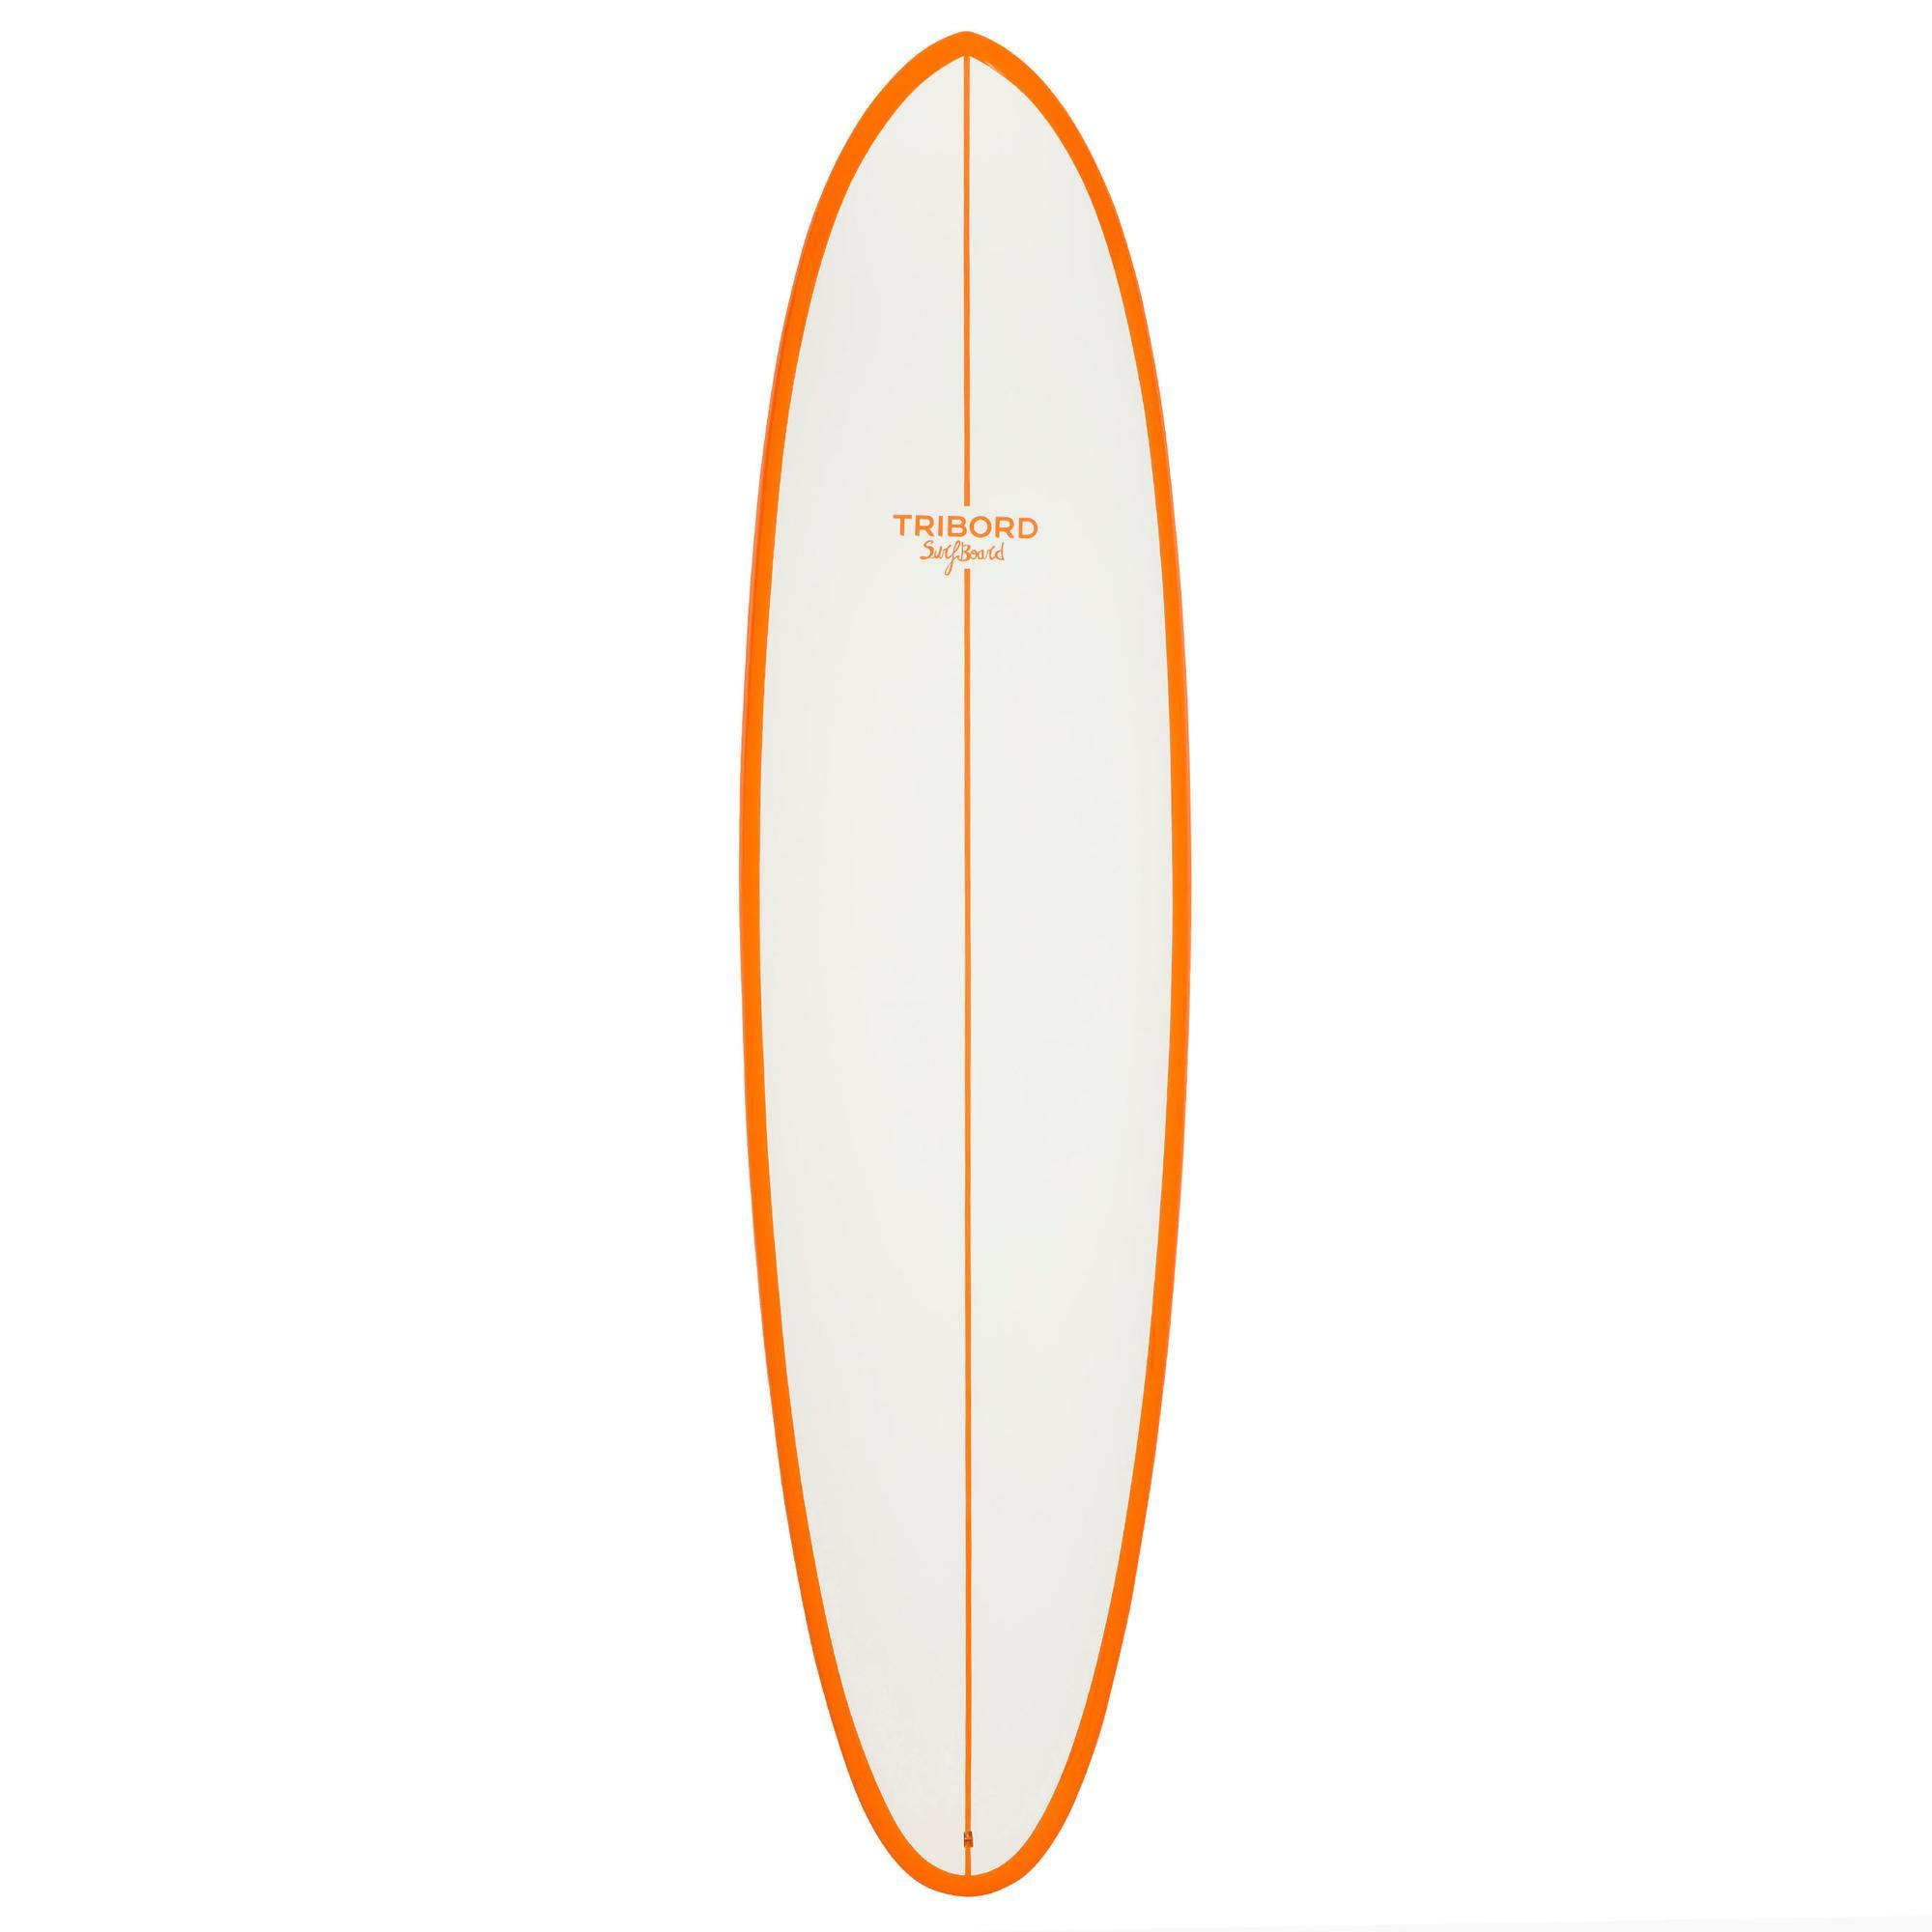 planche de surf 500 7 39 2 blanc orange r sine epoxy tribordvoile. Black Bedroom Furniture Sets. Home Design Ideas